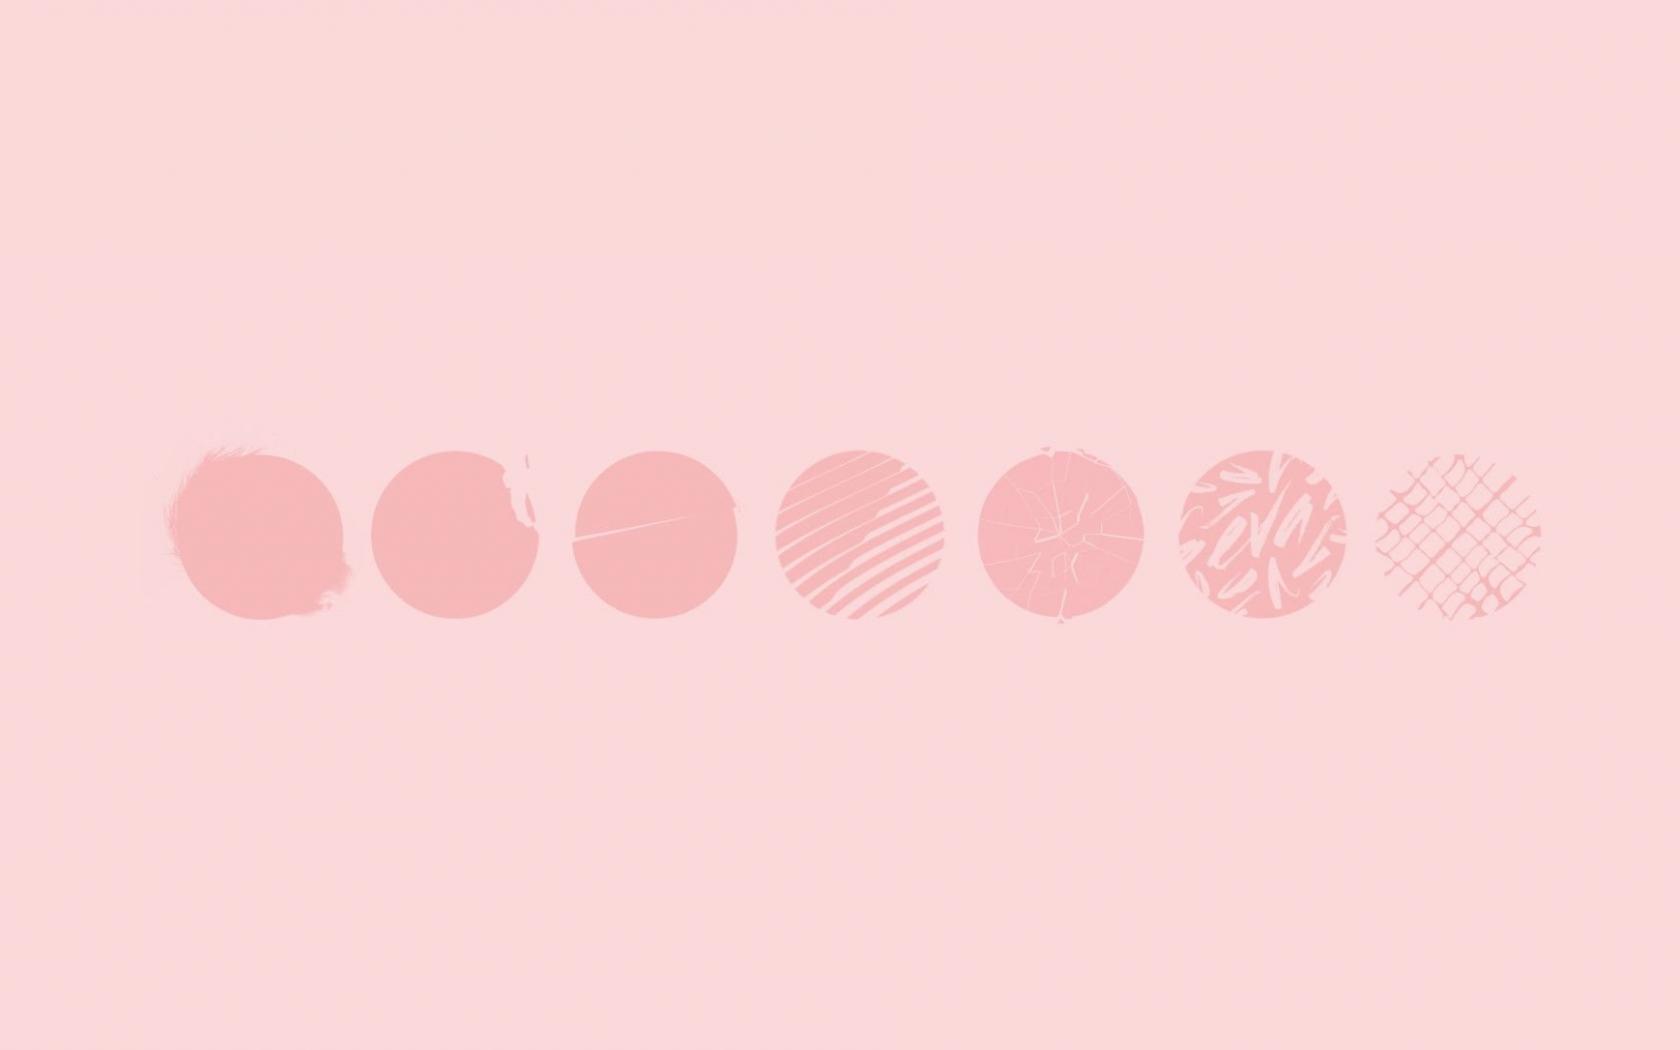 Free Download Aesthetic Cute Korean Desktop Wallpaper 1920x1086 For Your Desktop Mobile Tablet Explore 38 The Best Korean Aesthetic Wallpapers The Best Korean Aesthetic Wallpapers Korean Wallpaper Korean Wallpaper Malaysia